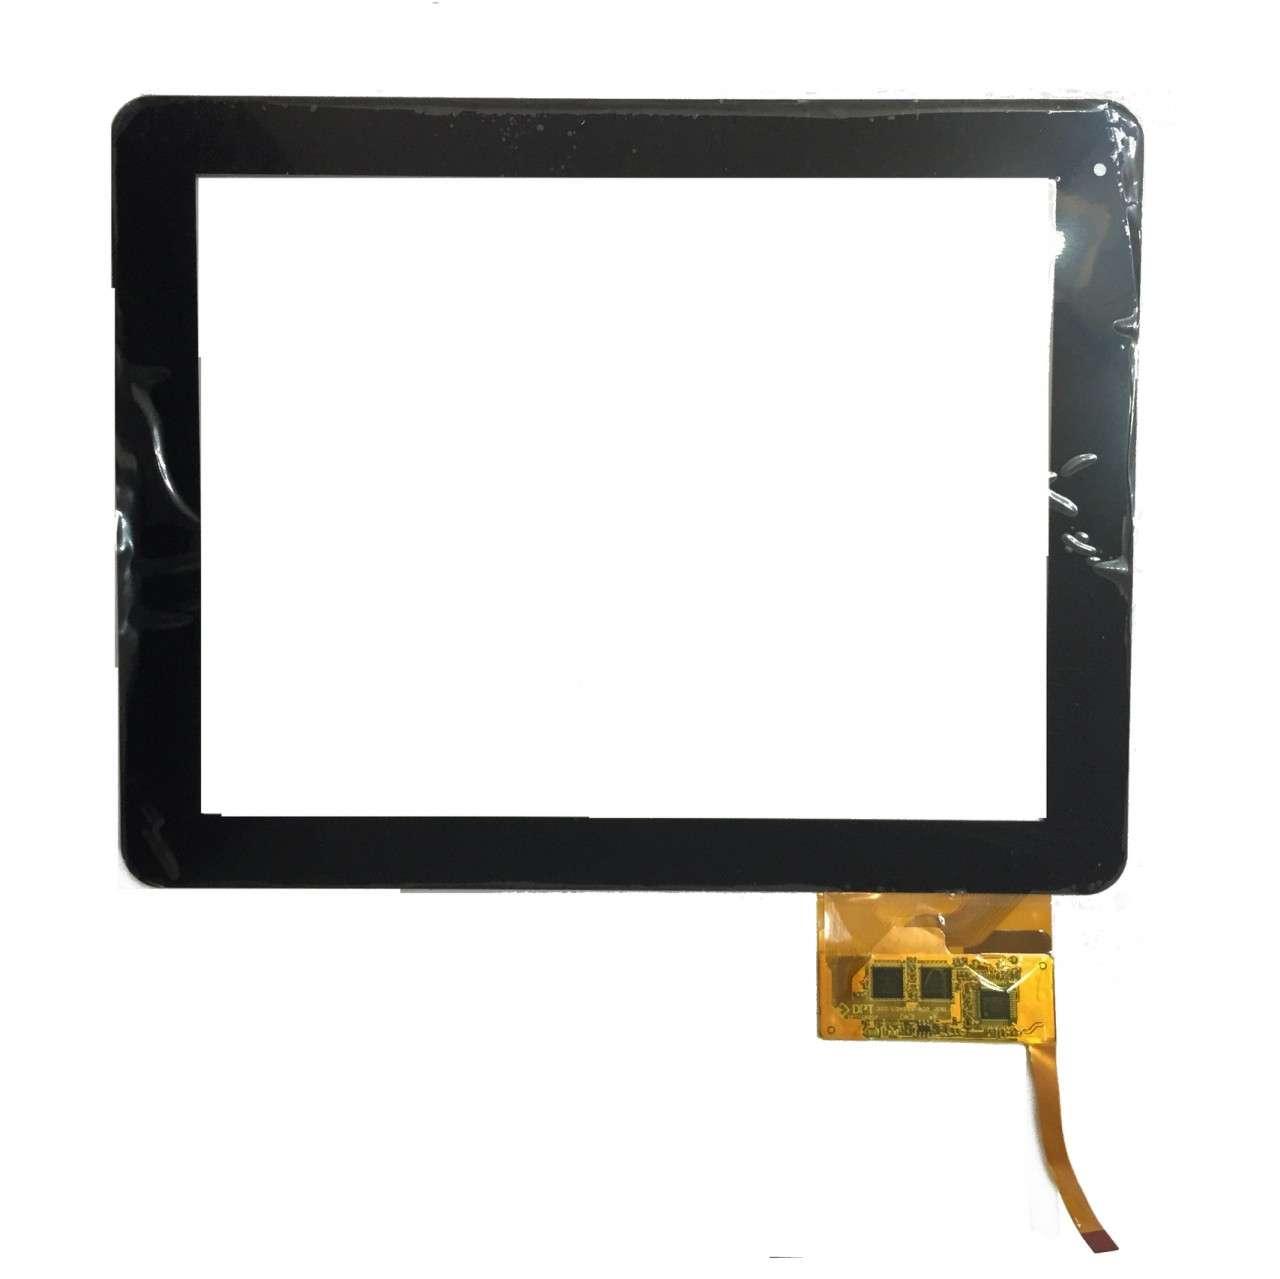 Touchscreen Digitizer GoClever TAB A104.2 Geam Sticla Tableta imagine powerlaptop.ro 2021